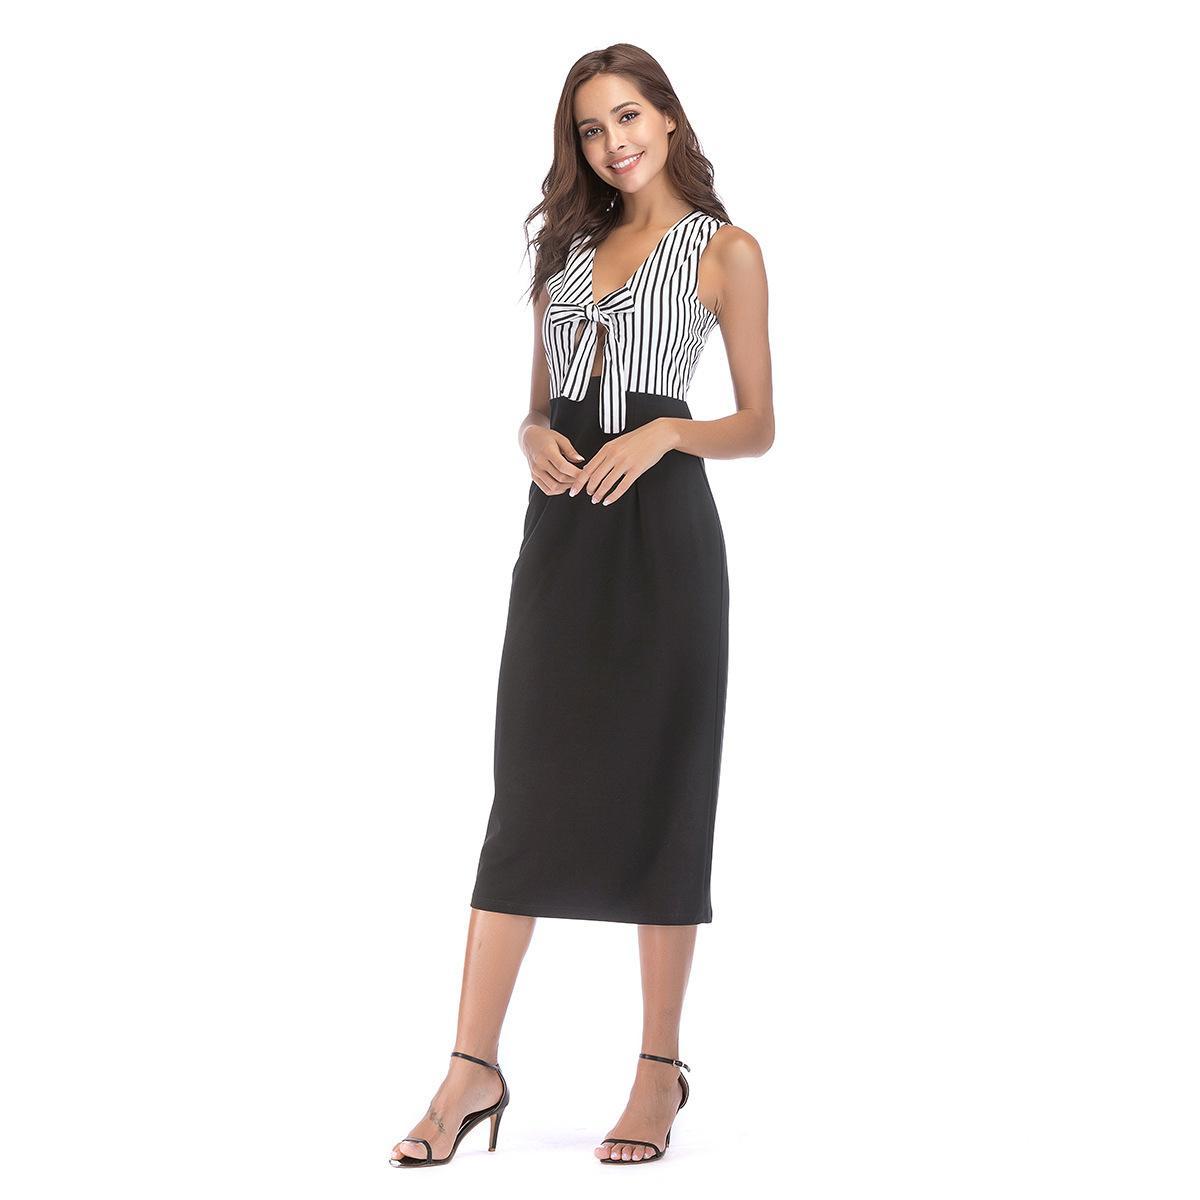 2018 Autumn New Pattern Suit Dress Dress Off Two Paper V Lead Stripe Split  Joint Pencil Skirt Knit Sundresses Dressing Style For Women From Elionbaby 22fd70b2f